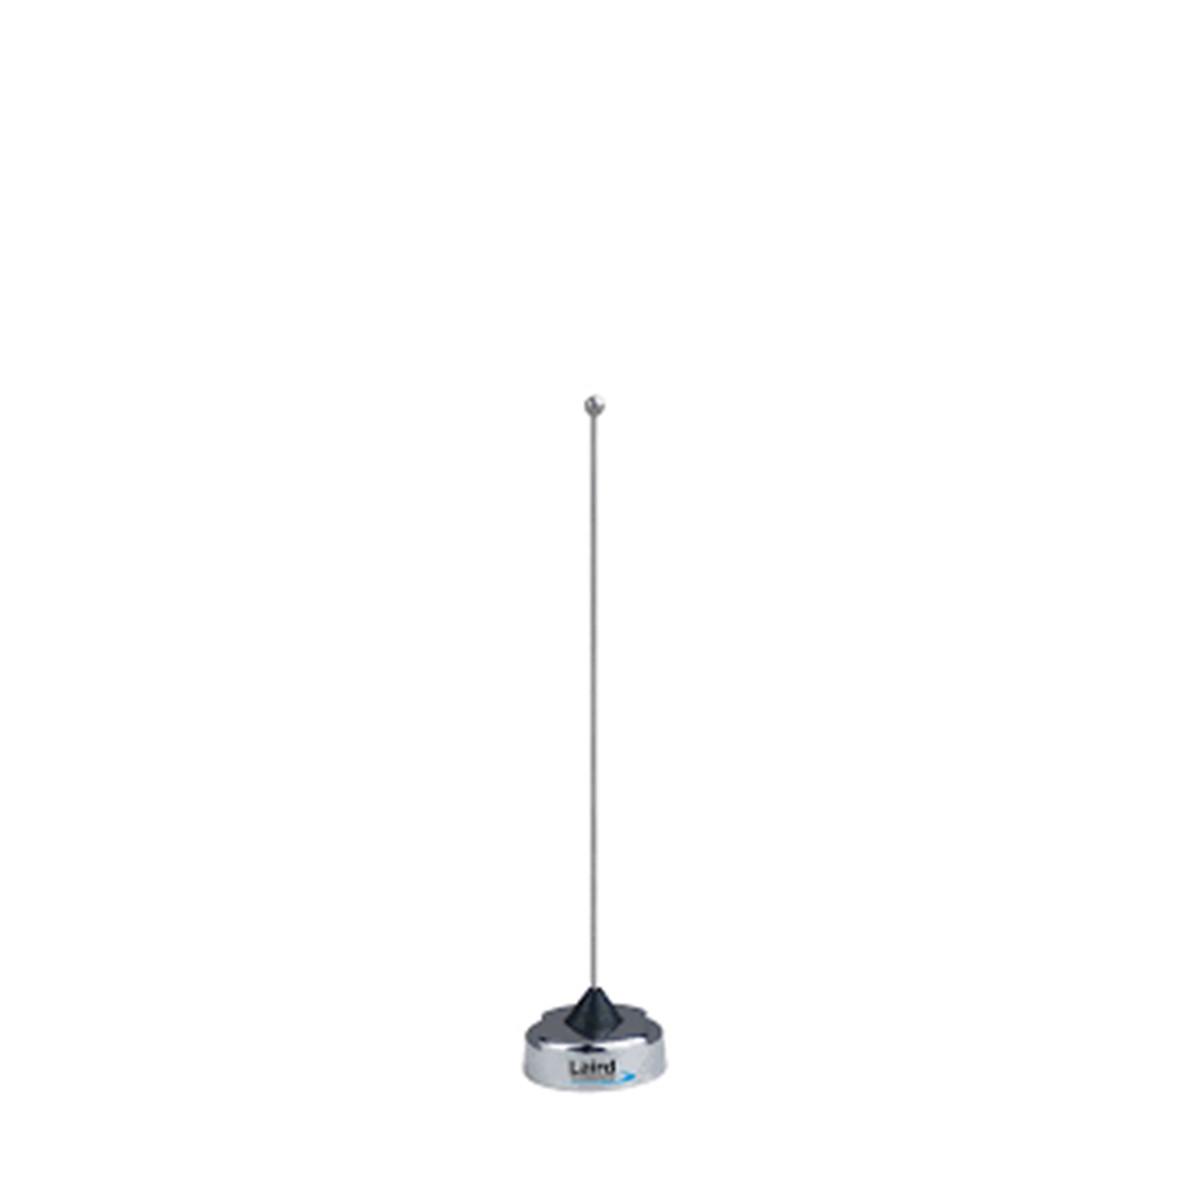 Antena Pctel para radio base UHF 430-470 MHz tipo látigo PCTCN4347